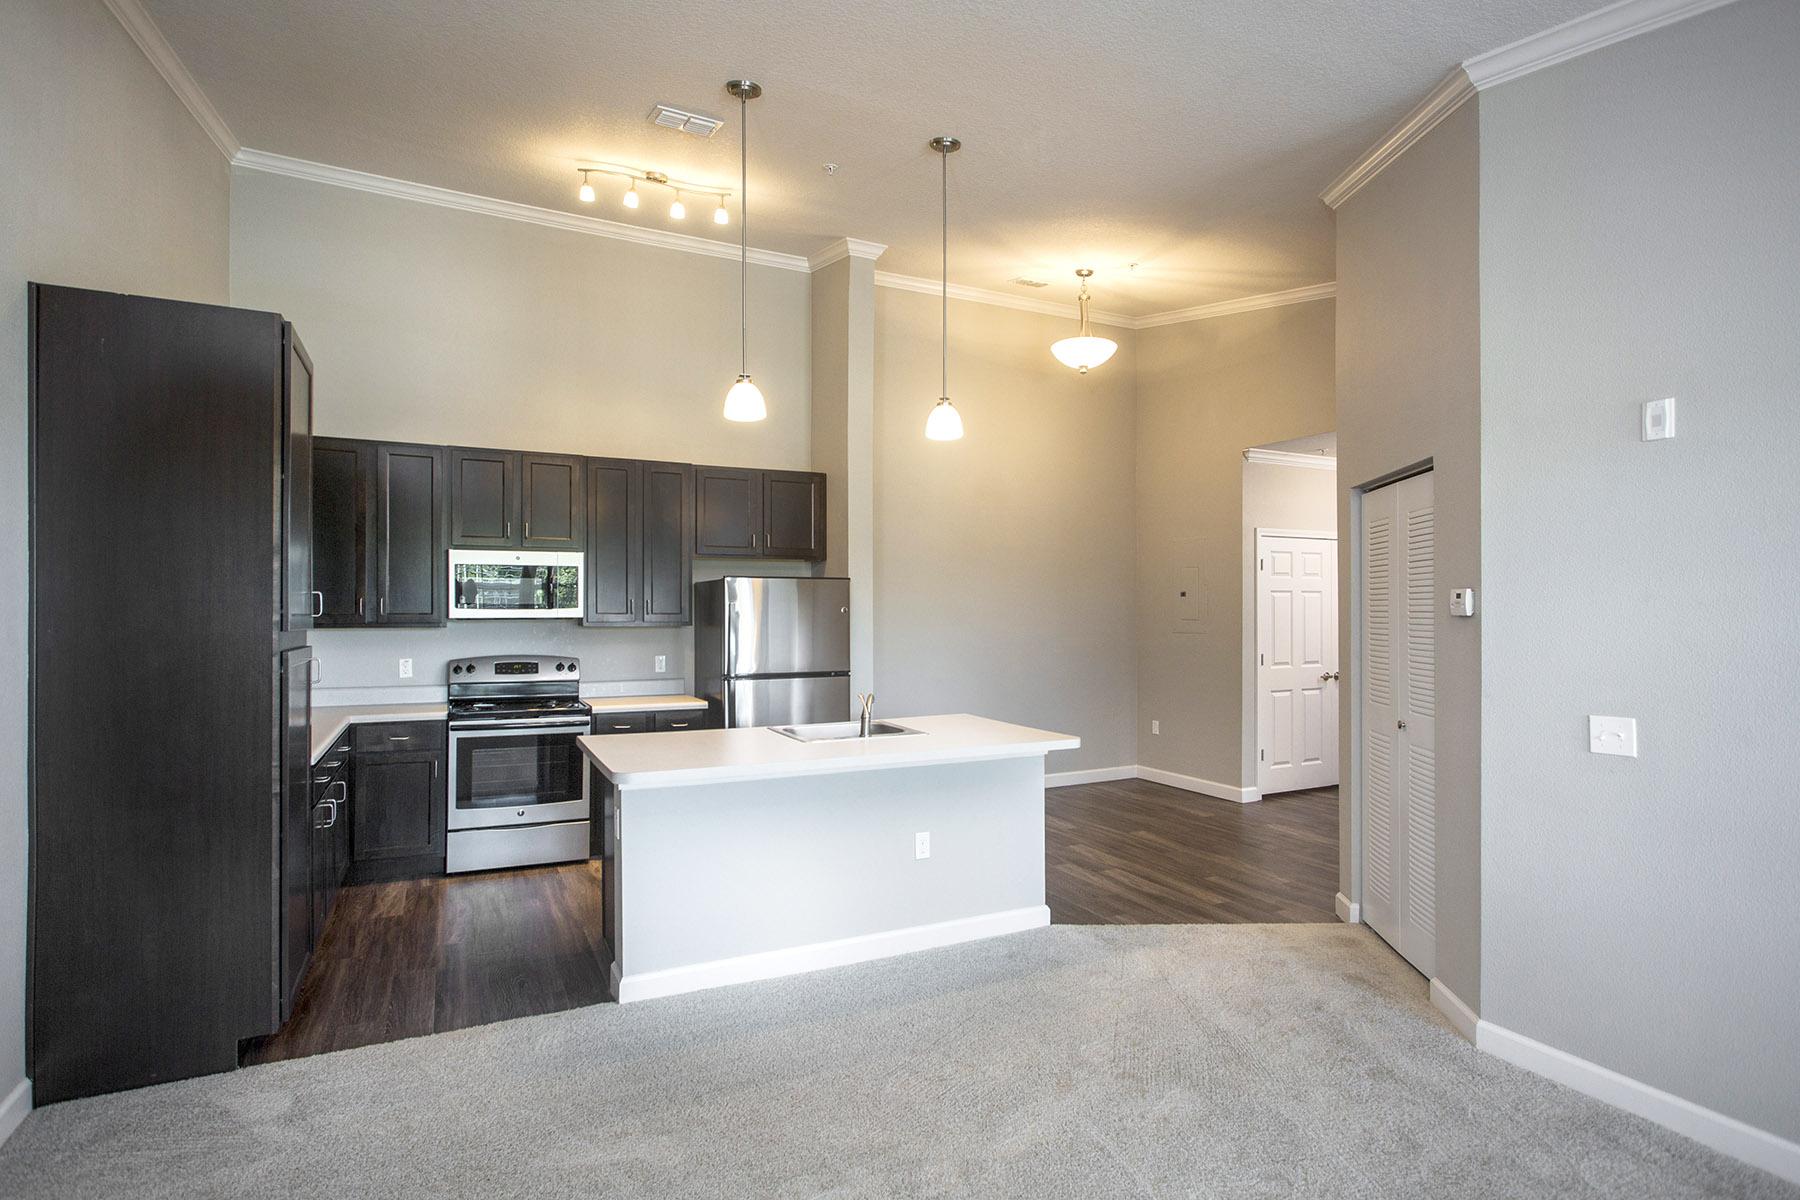 CharlestonEdge-Rental-Apartment-Brandon-Tampa-Florida-Pool-Bedrooms-Interior-1.jpg